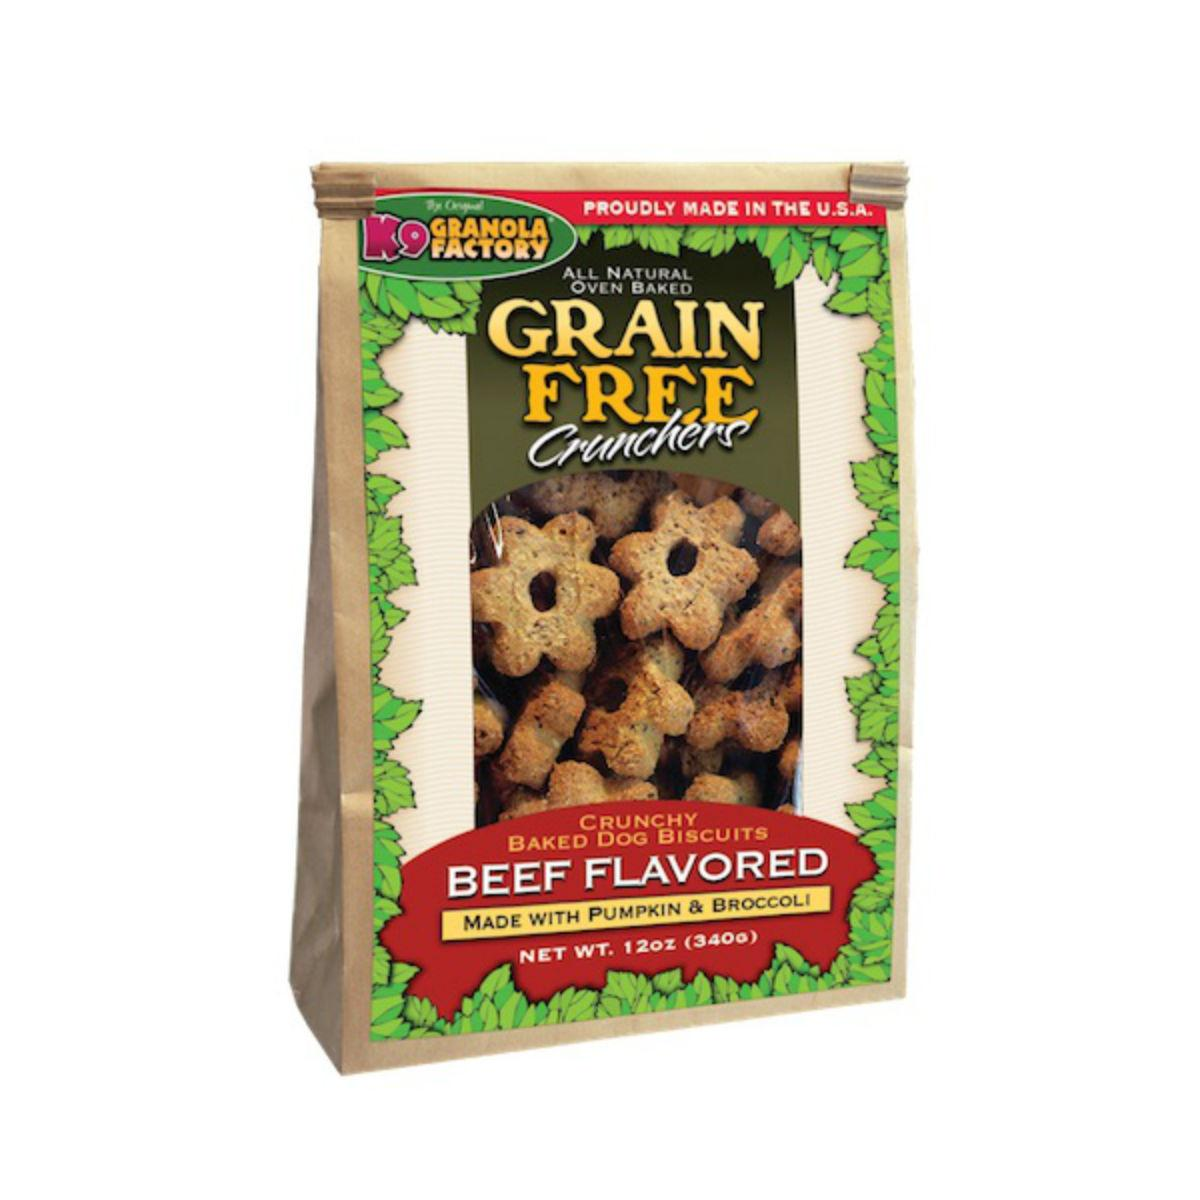 K9 Granola Factory Grain Free Crunchers Dog Treat - Dried Beef with Pumpkin & Broccoli